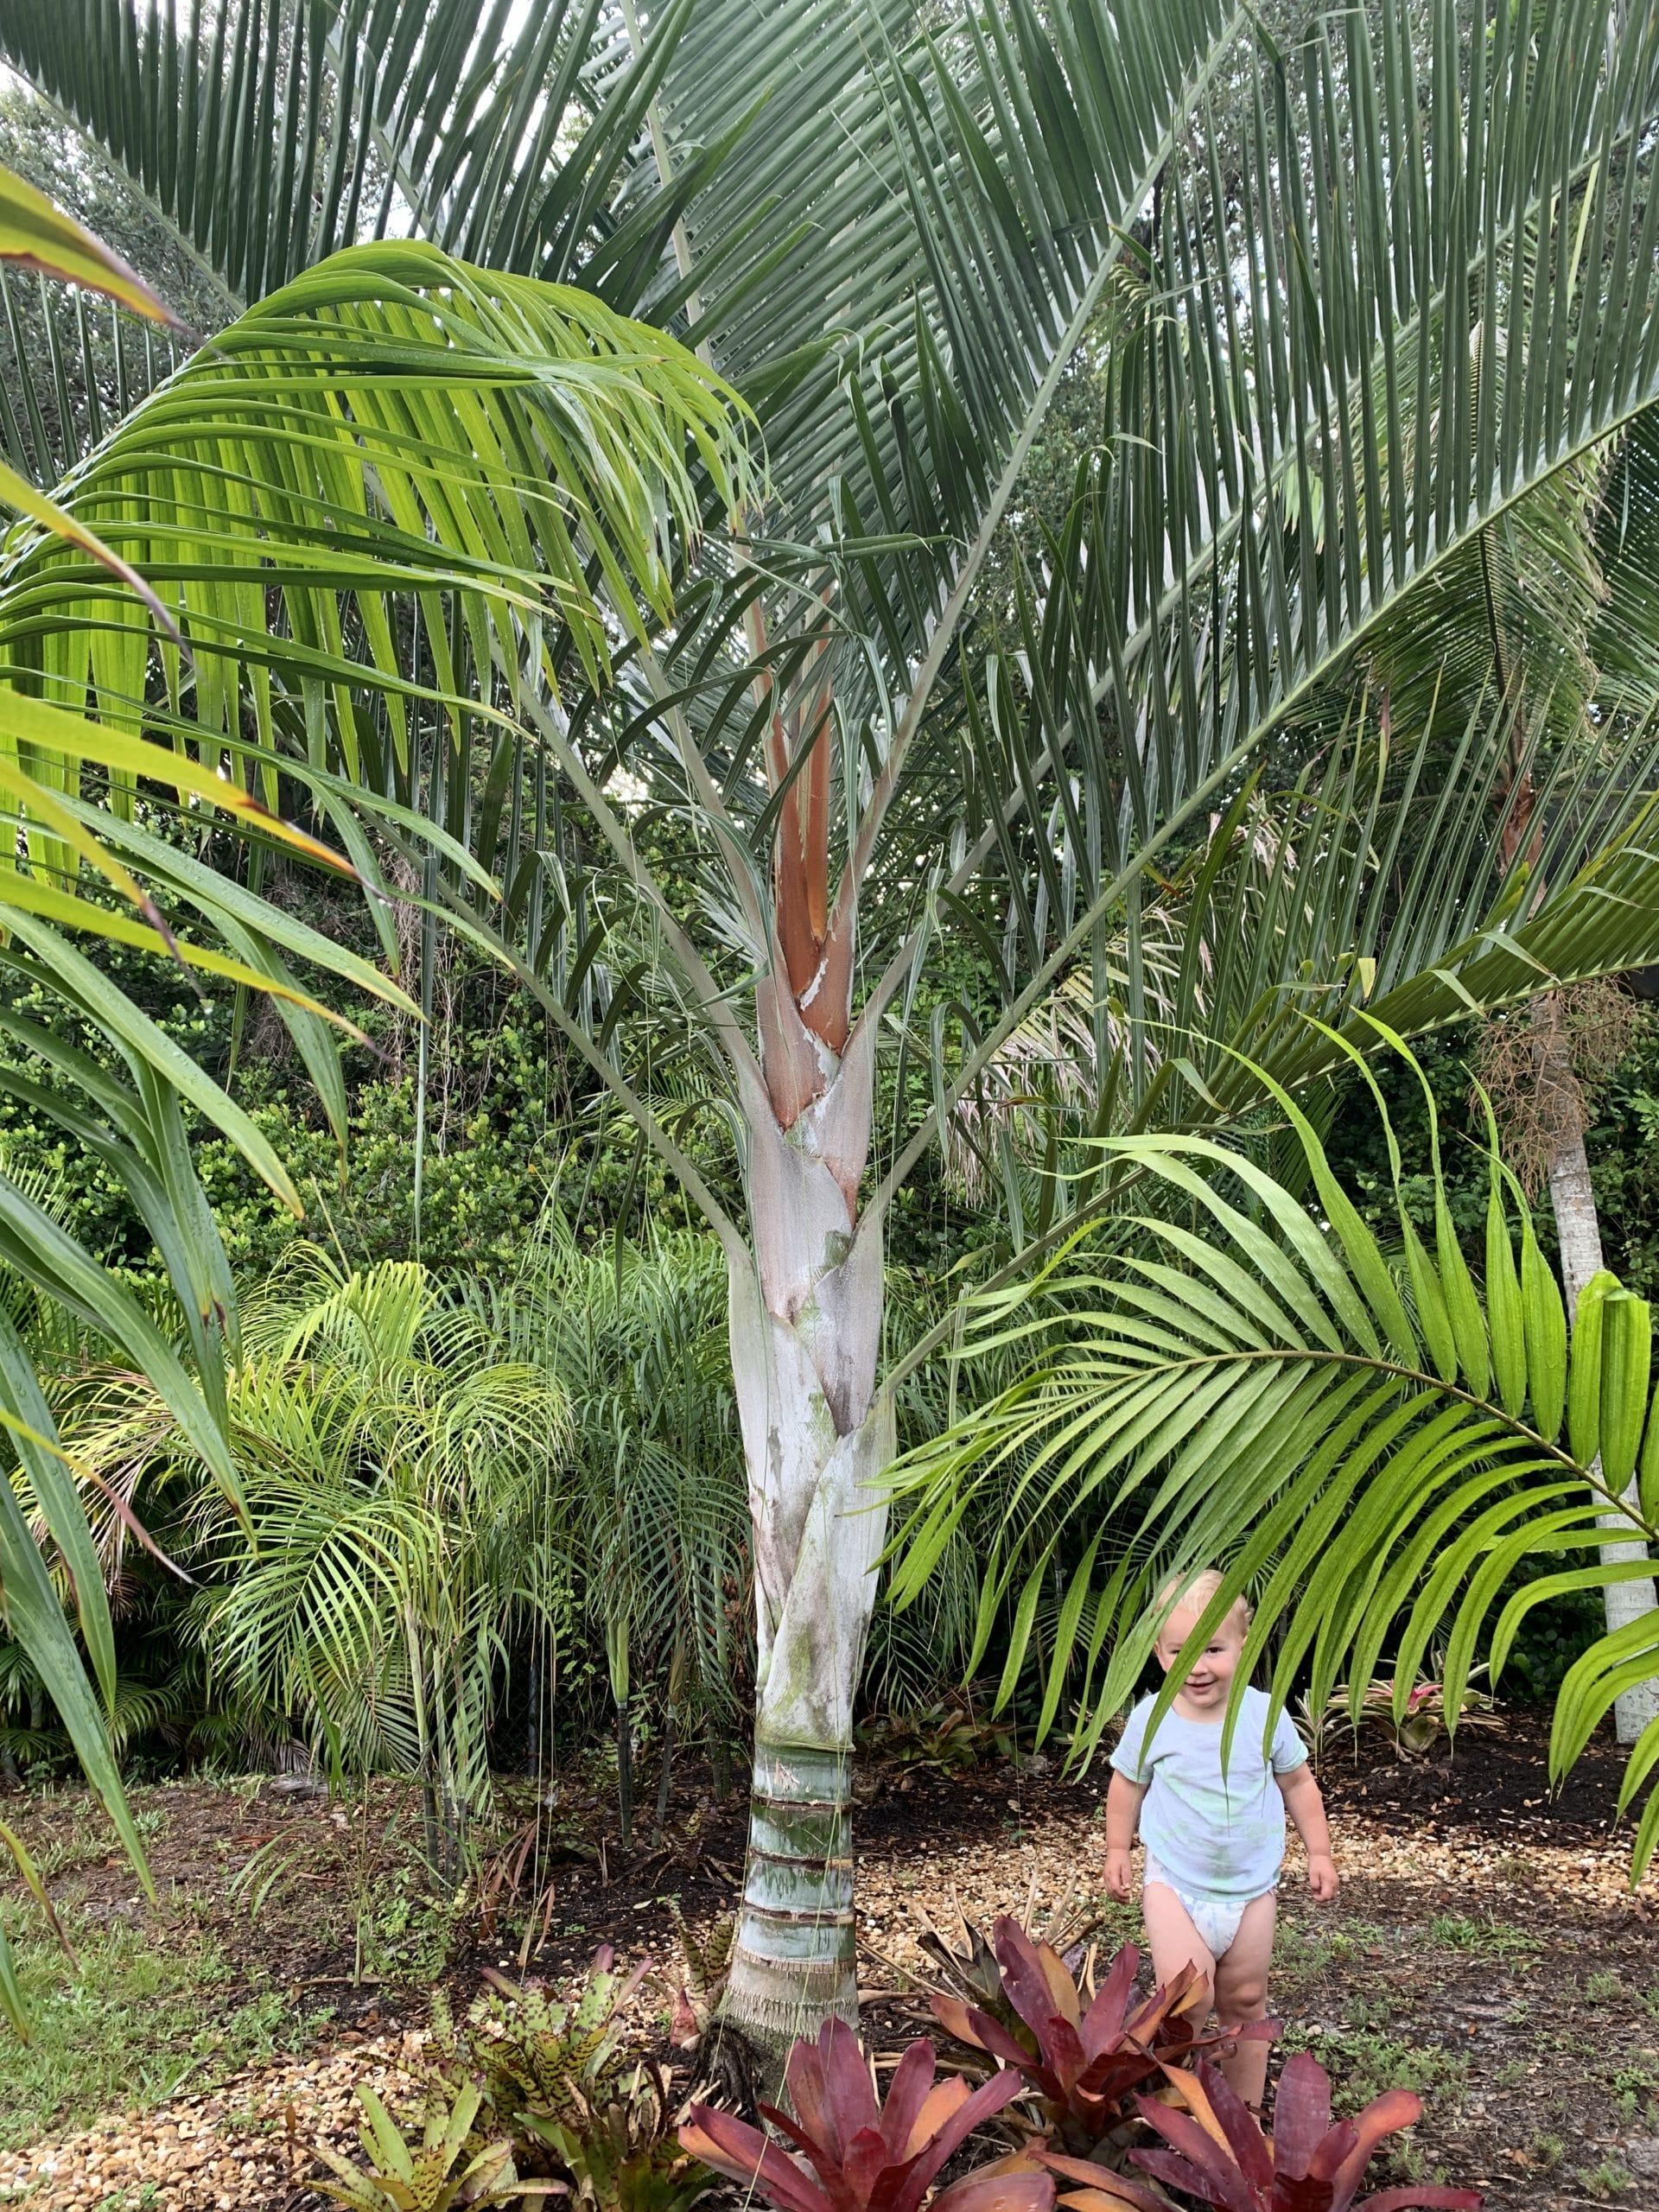 , Dypsis pembana x Dypsis decaryi (aka TriBana Palm)